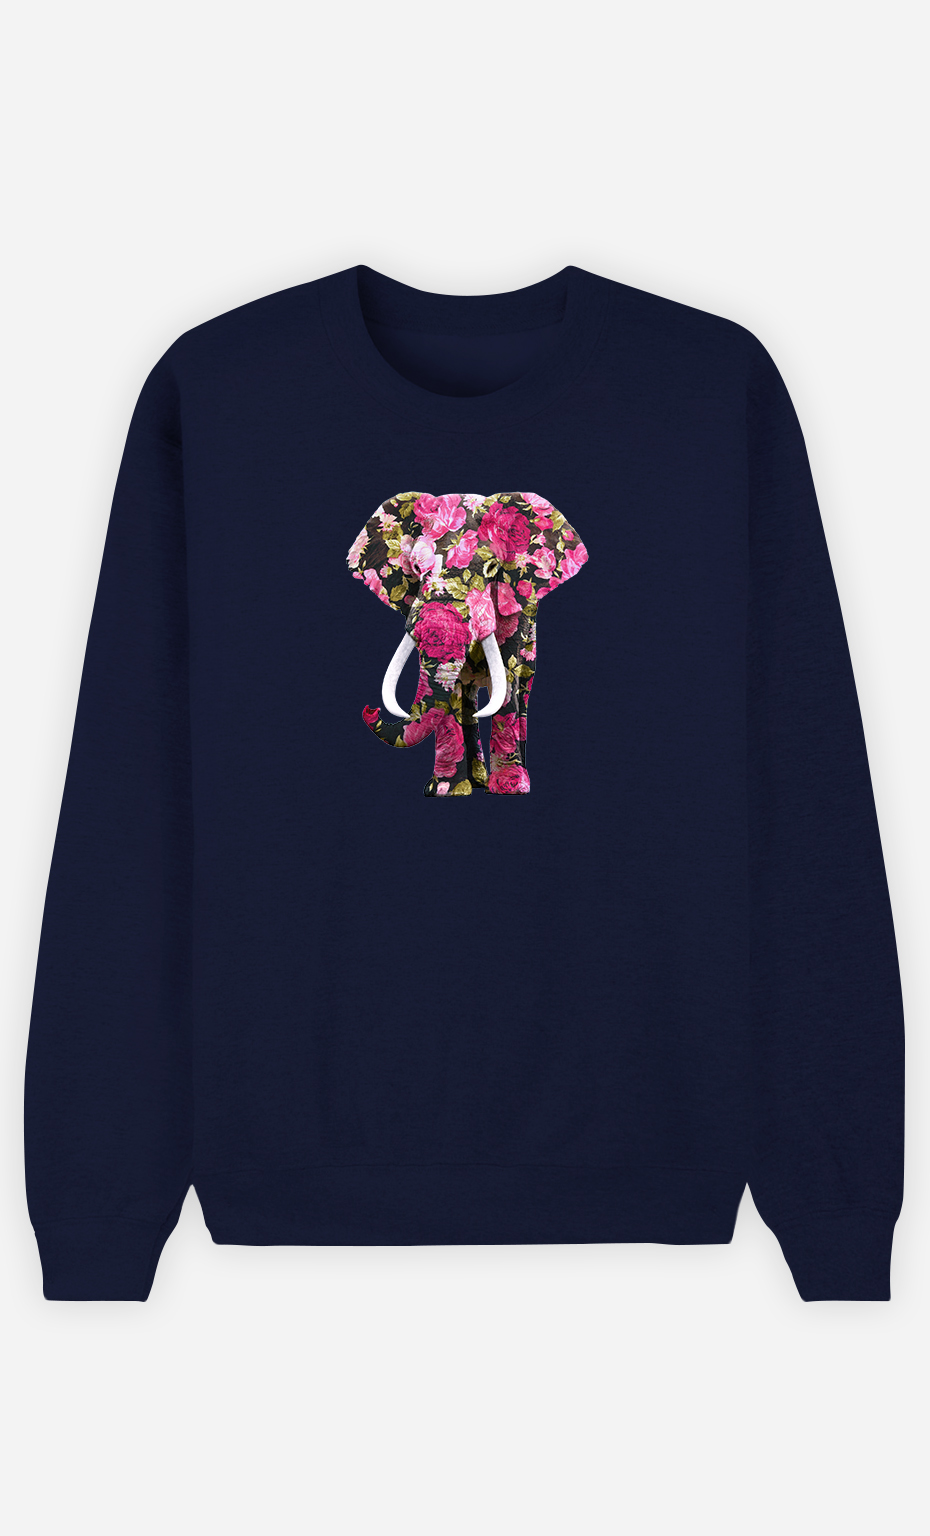 Sweatshirt Homme Floral Elephant